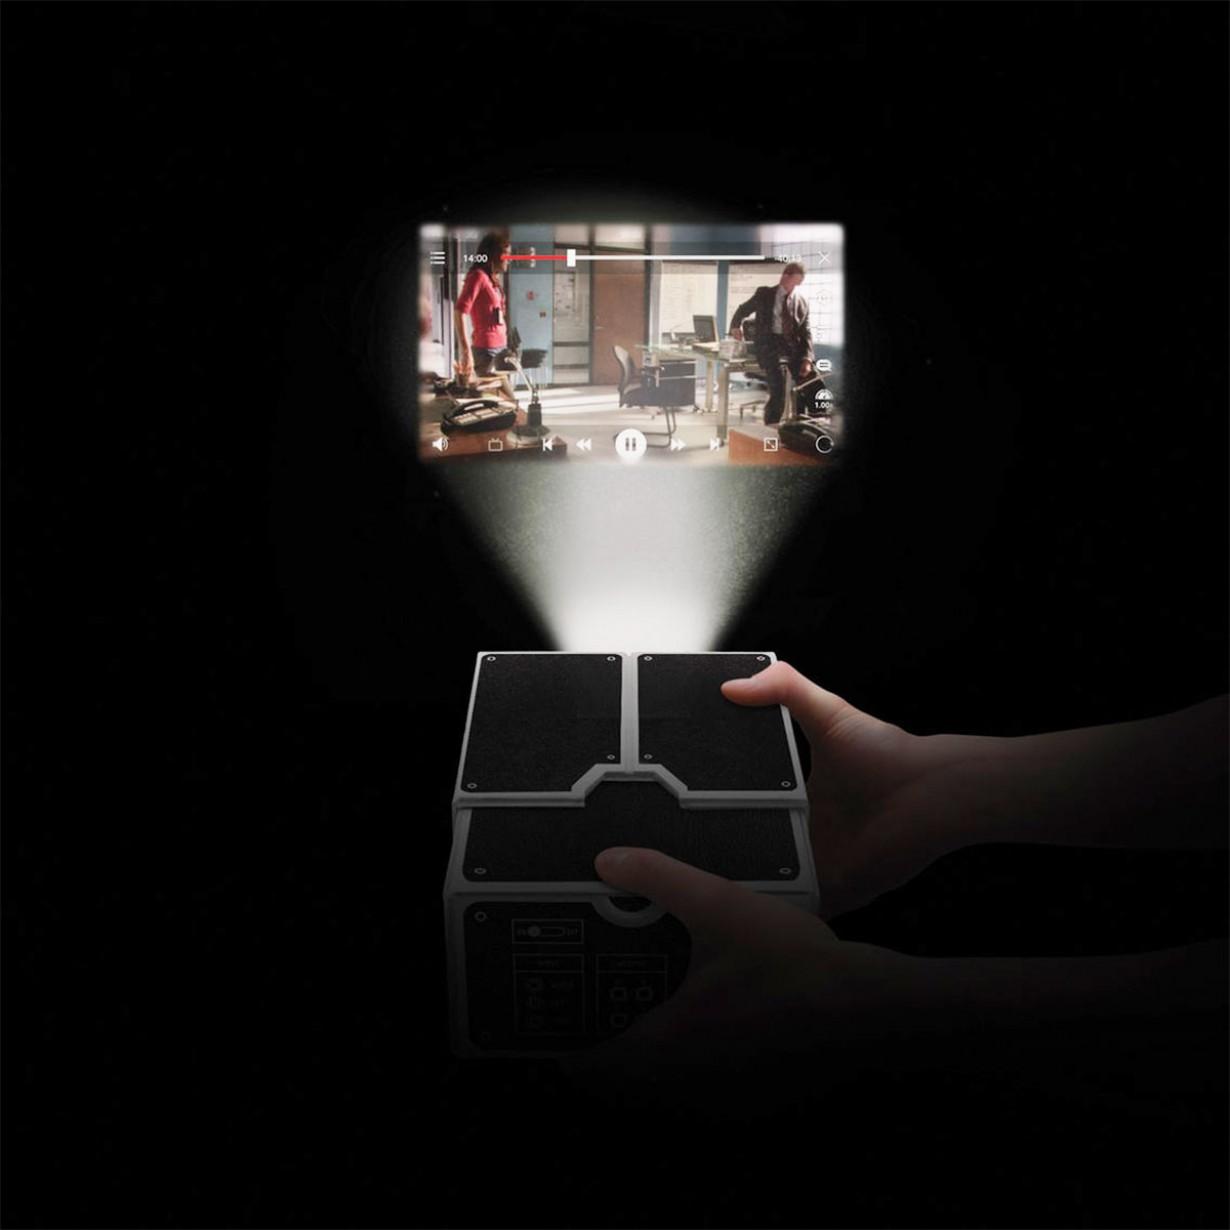 proiettore-di-cartone-per-smartphone-38a Searching for something special...